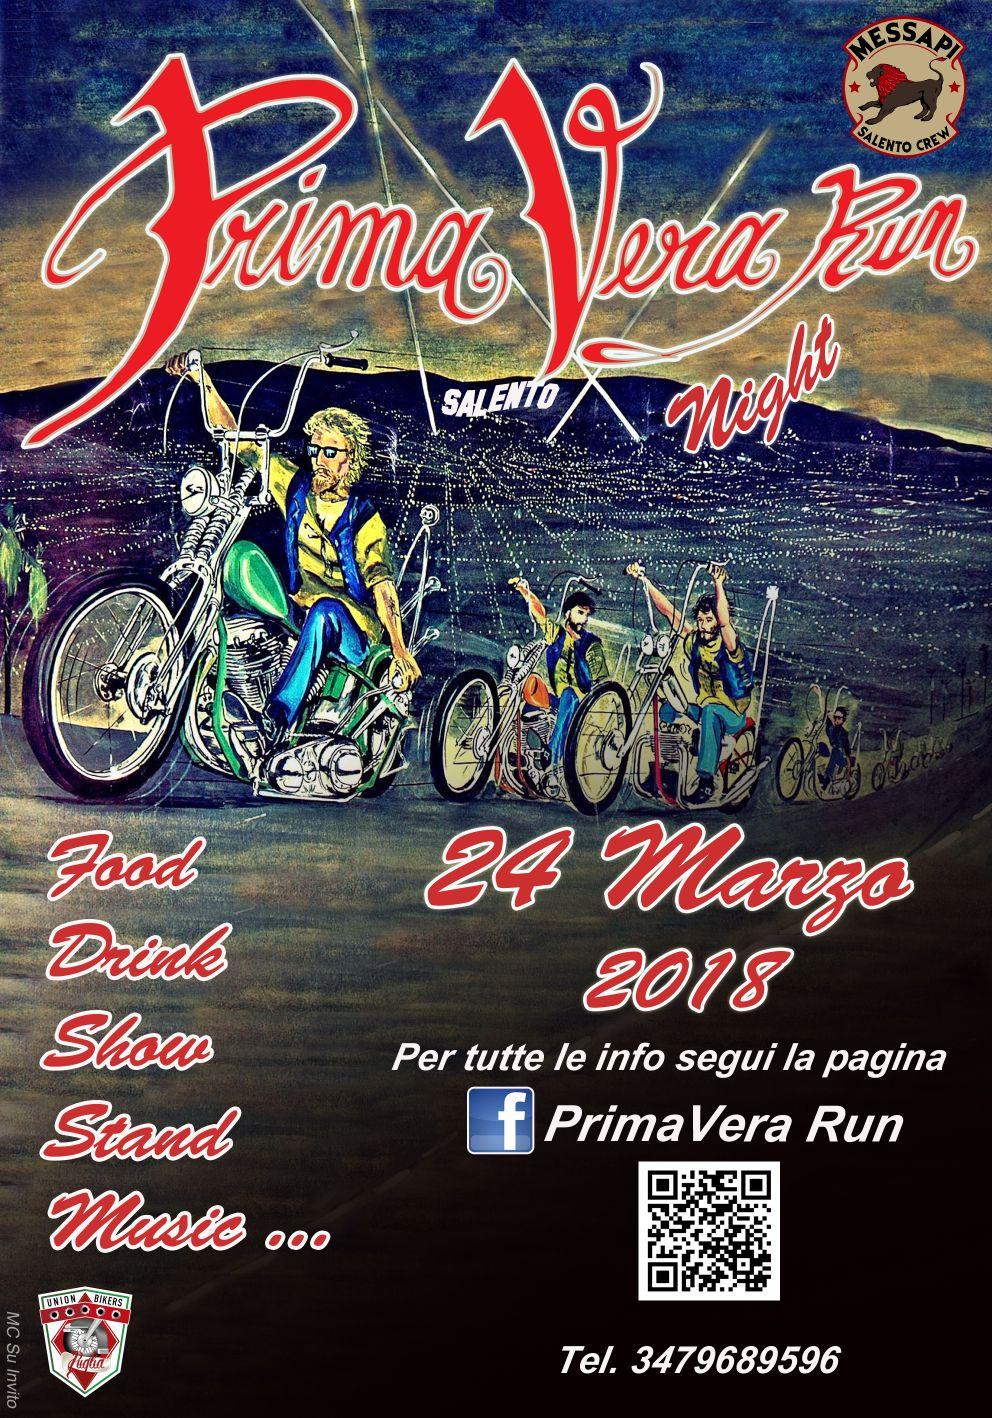 PrimaVera Run 2018